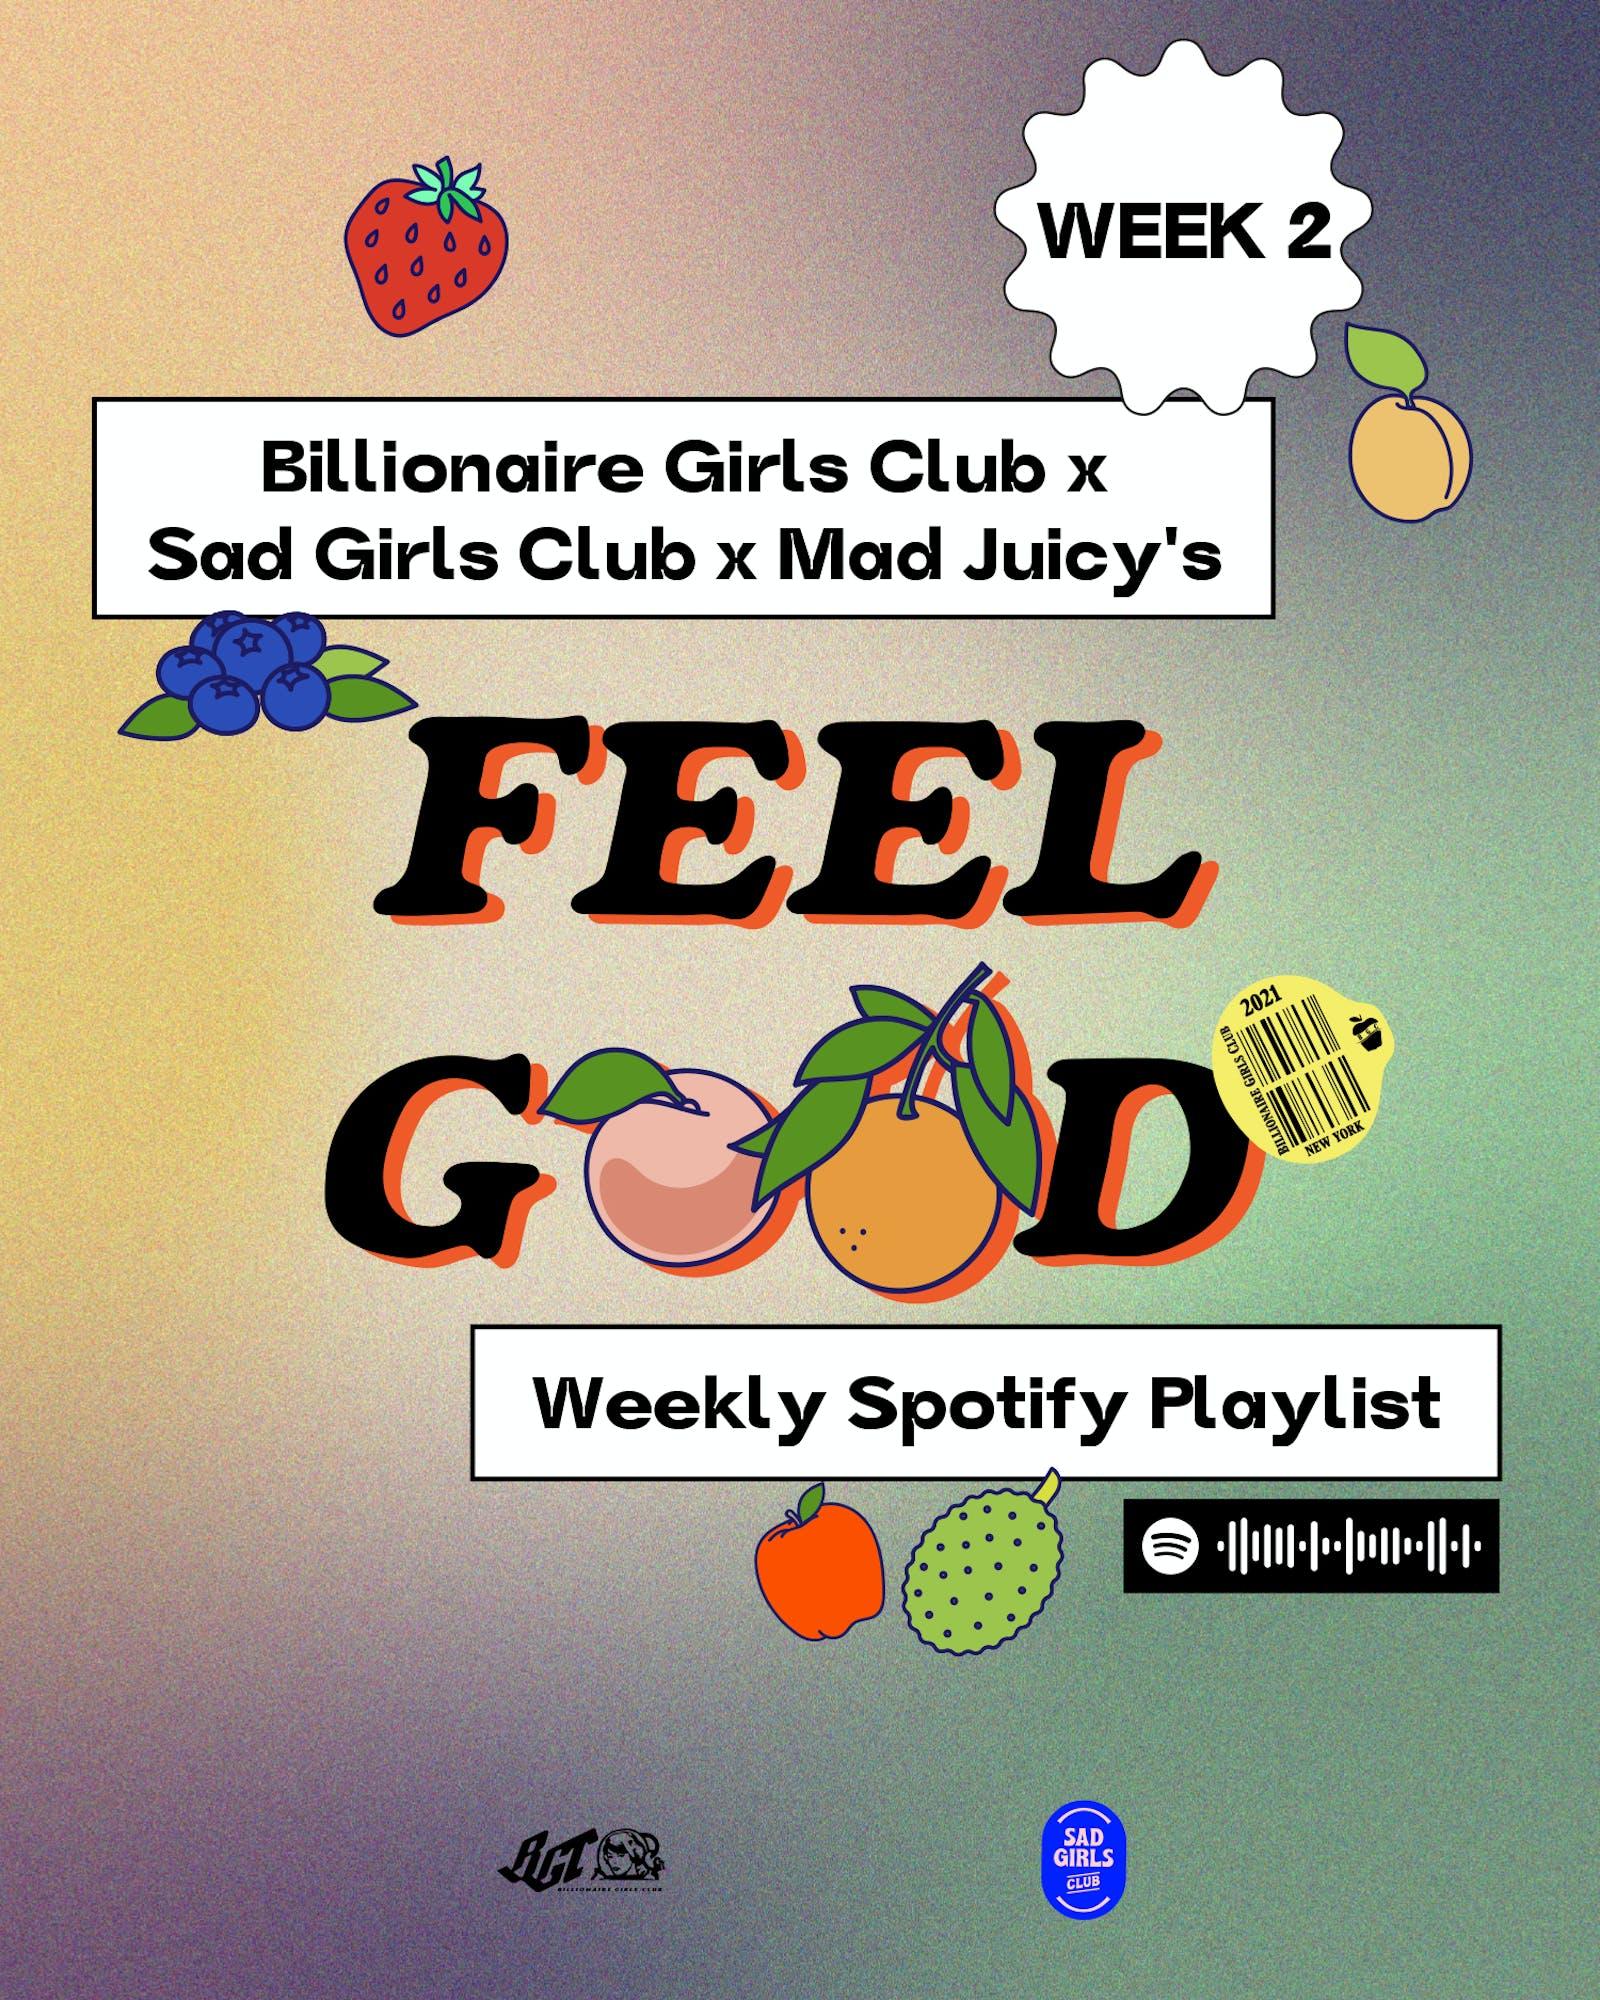 Billionaire Girls Club x Sad Girls Club X Mad Juicy Playlist